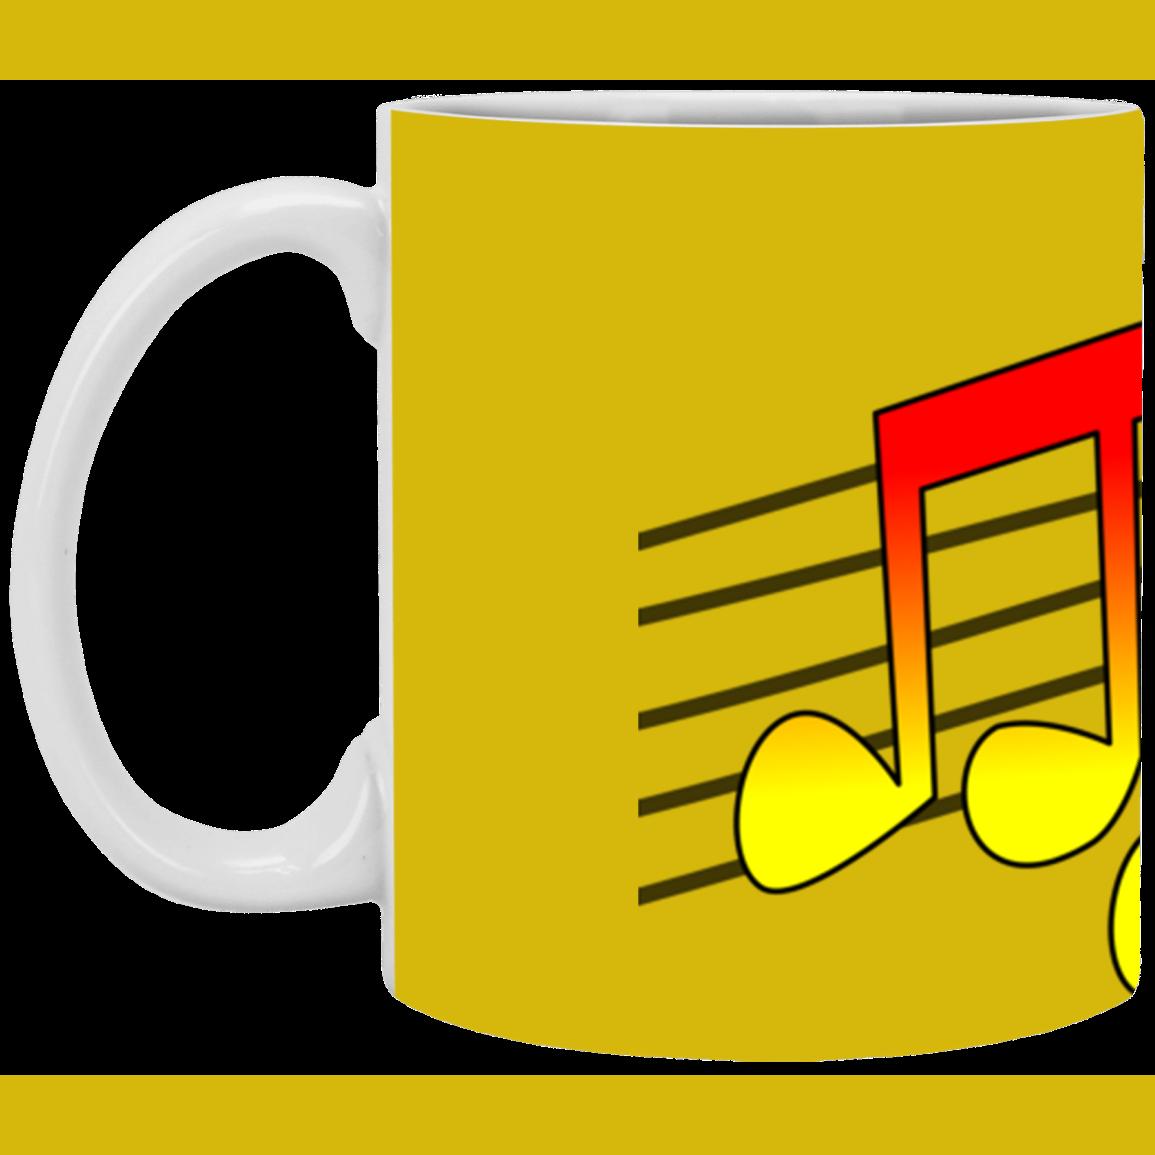 Xp oz white mug. Telephone clipart paper cup